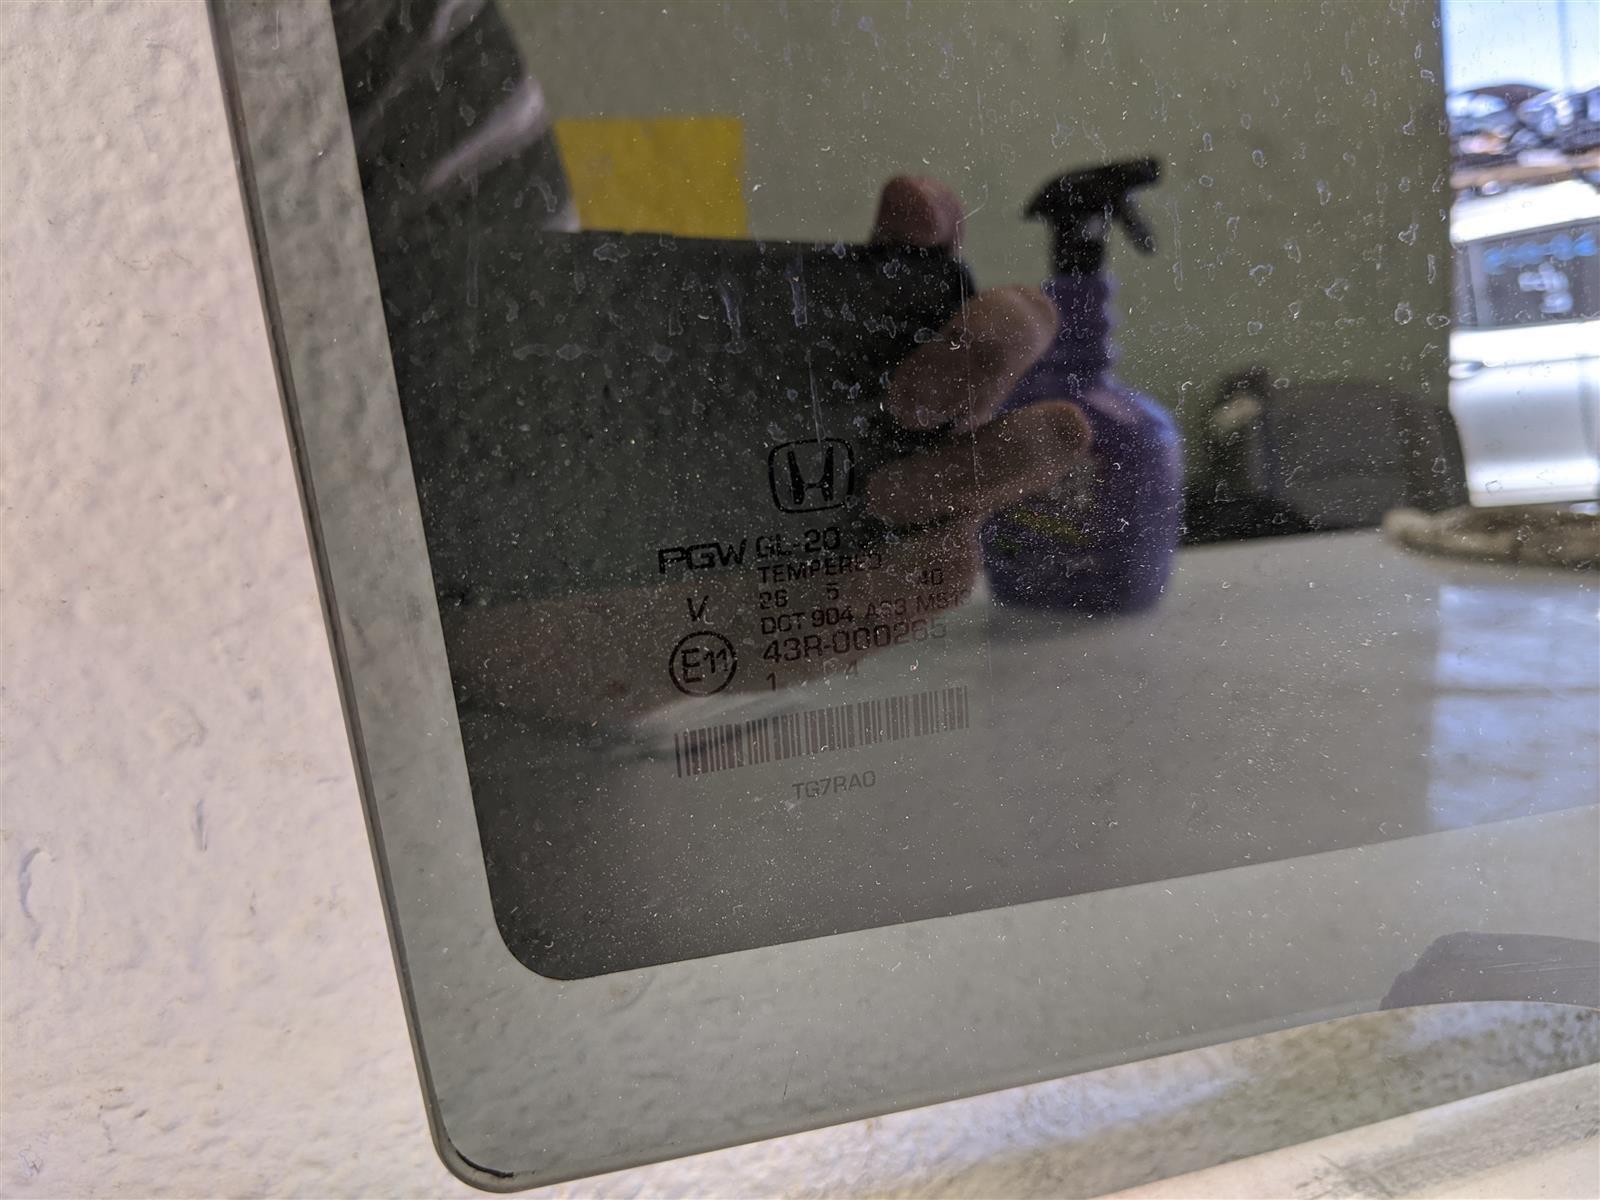 2016 Honda Pilot Rear Passenger Door Glass Window Replacement